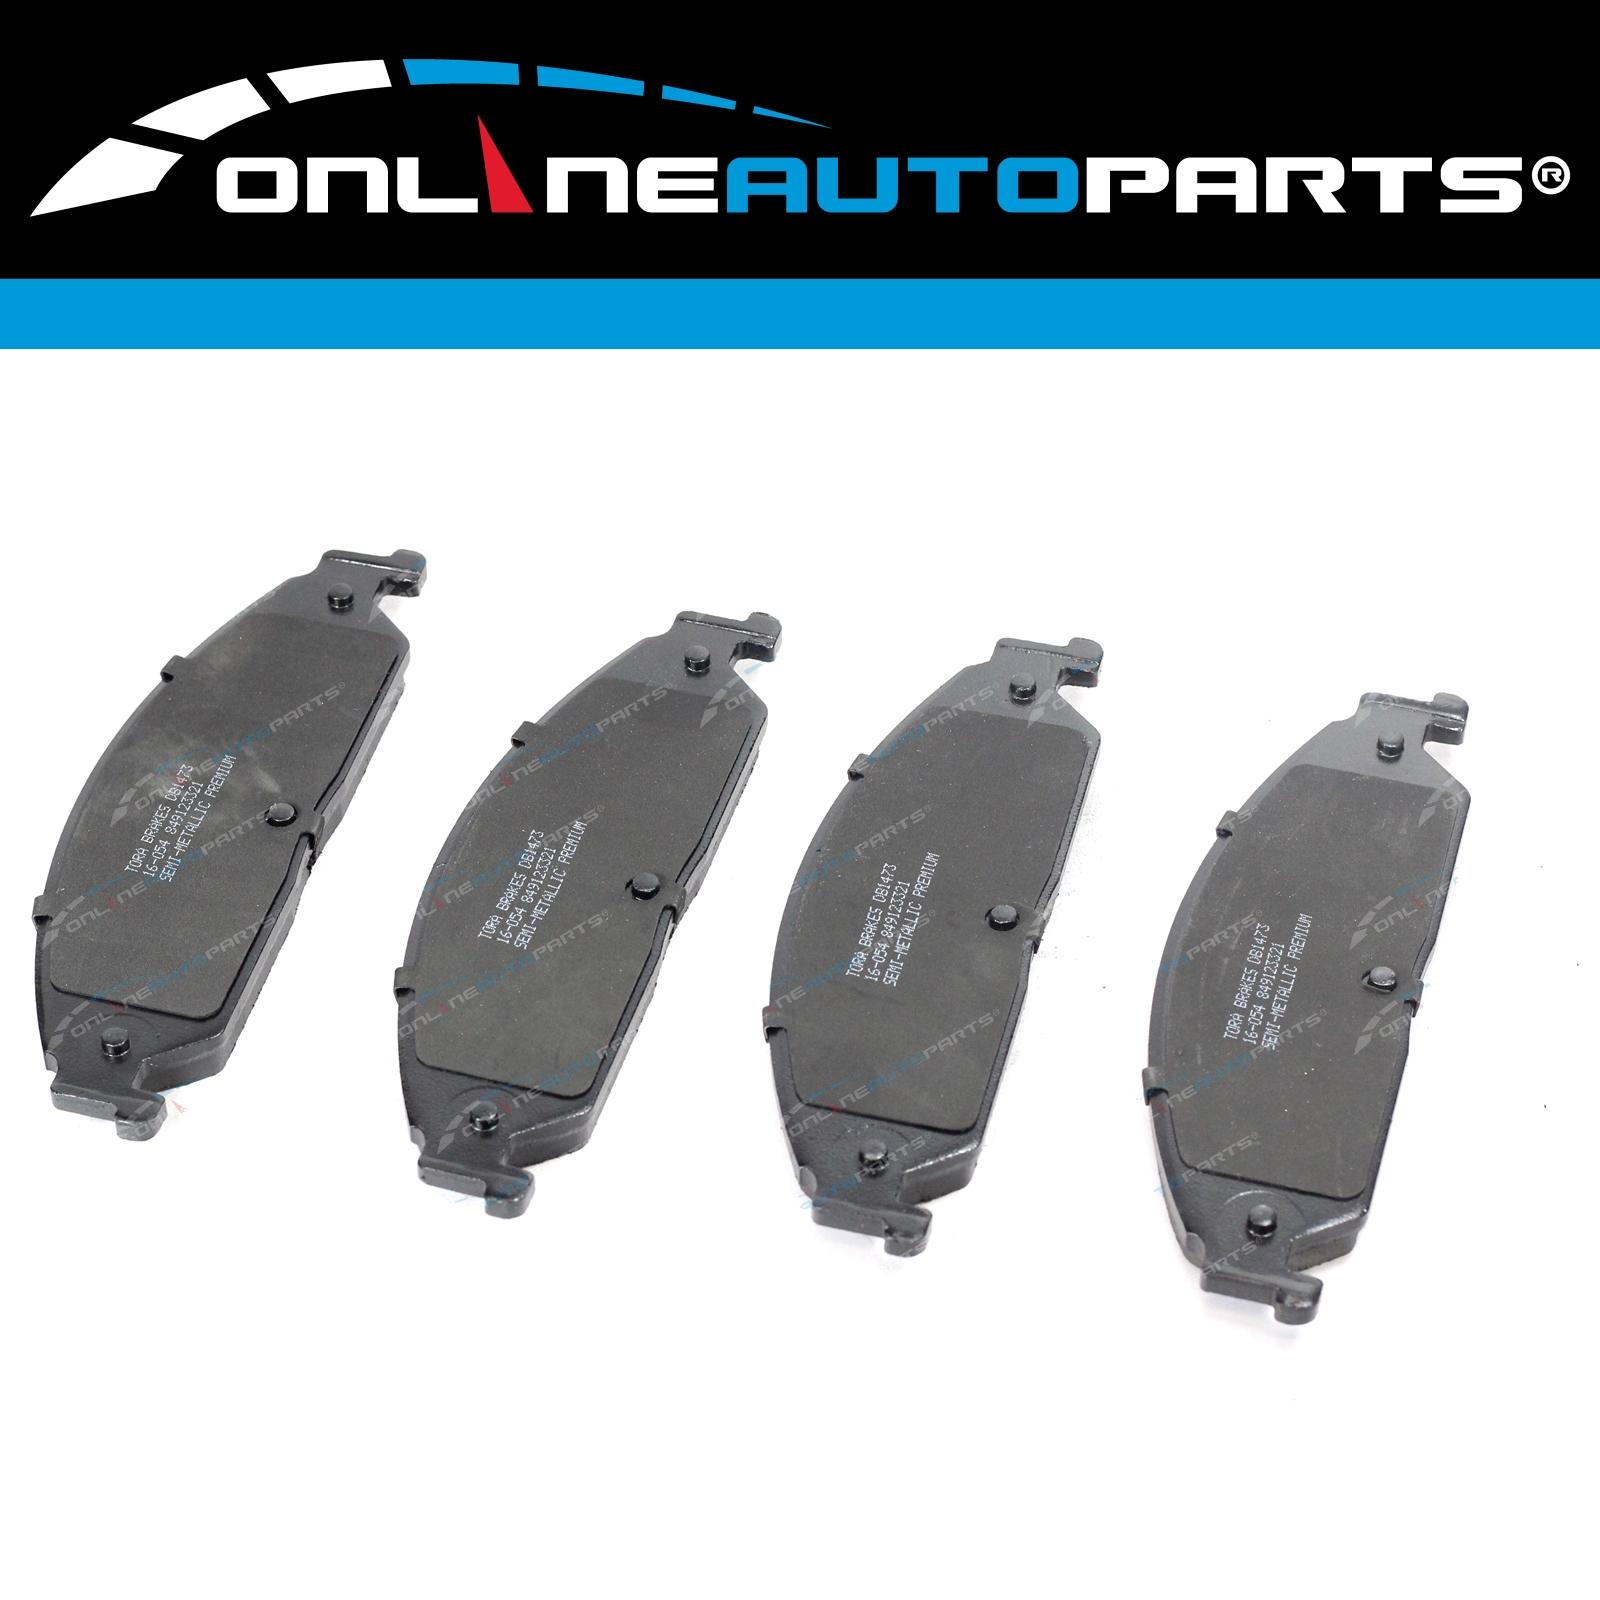 Front-Brake-Pads-Set-Falcon-BA-BF-XT-FG-Disc-Pad-XR6-XR8-Fairmont-Fairlane-LTD